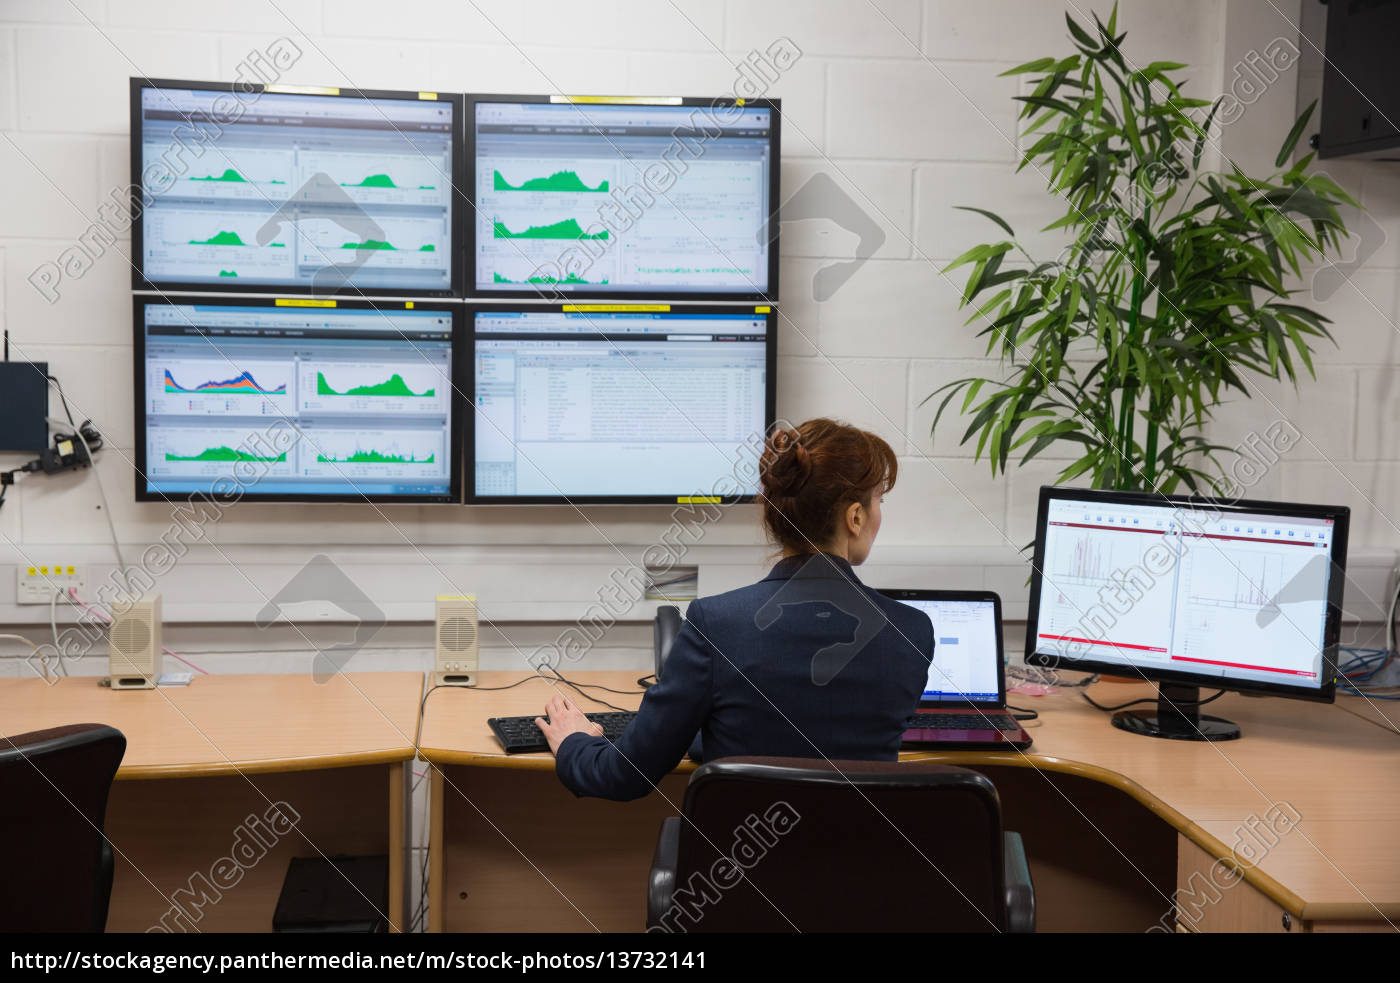 technician, sitting, in, office, running, diagnostics - 13732141